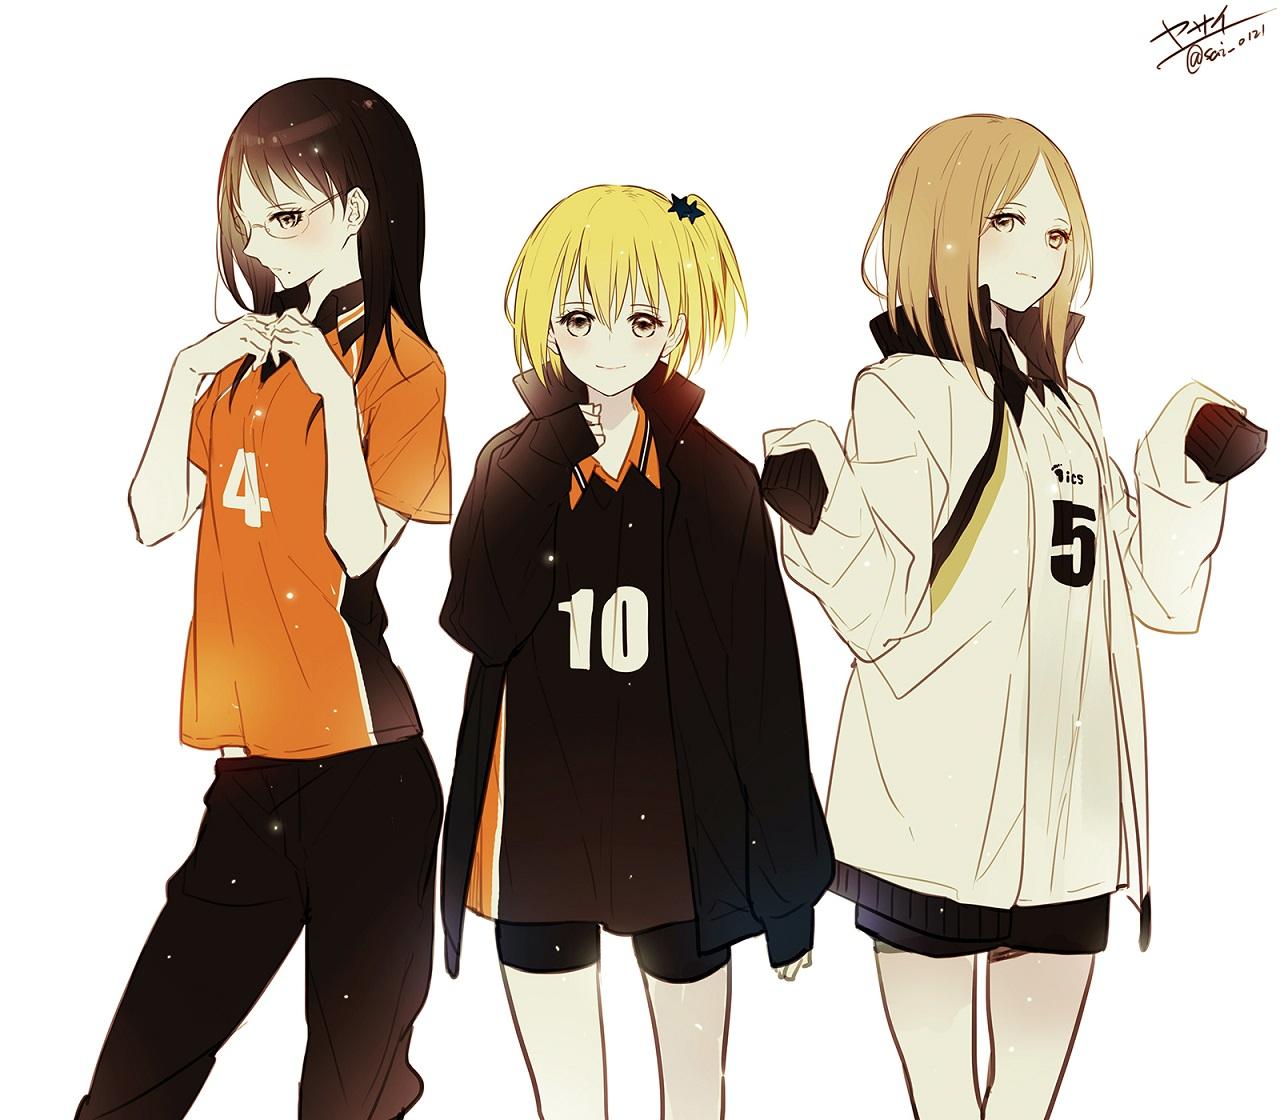 Haikyuu!! Image #1816930 - Zerochan Anime Image Board